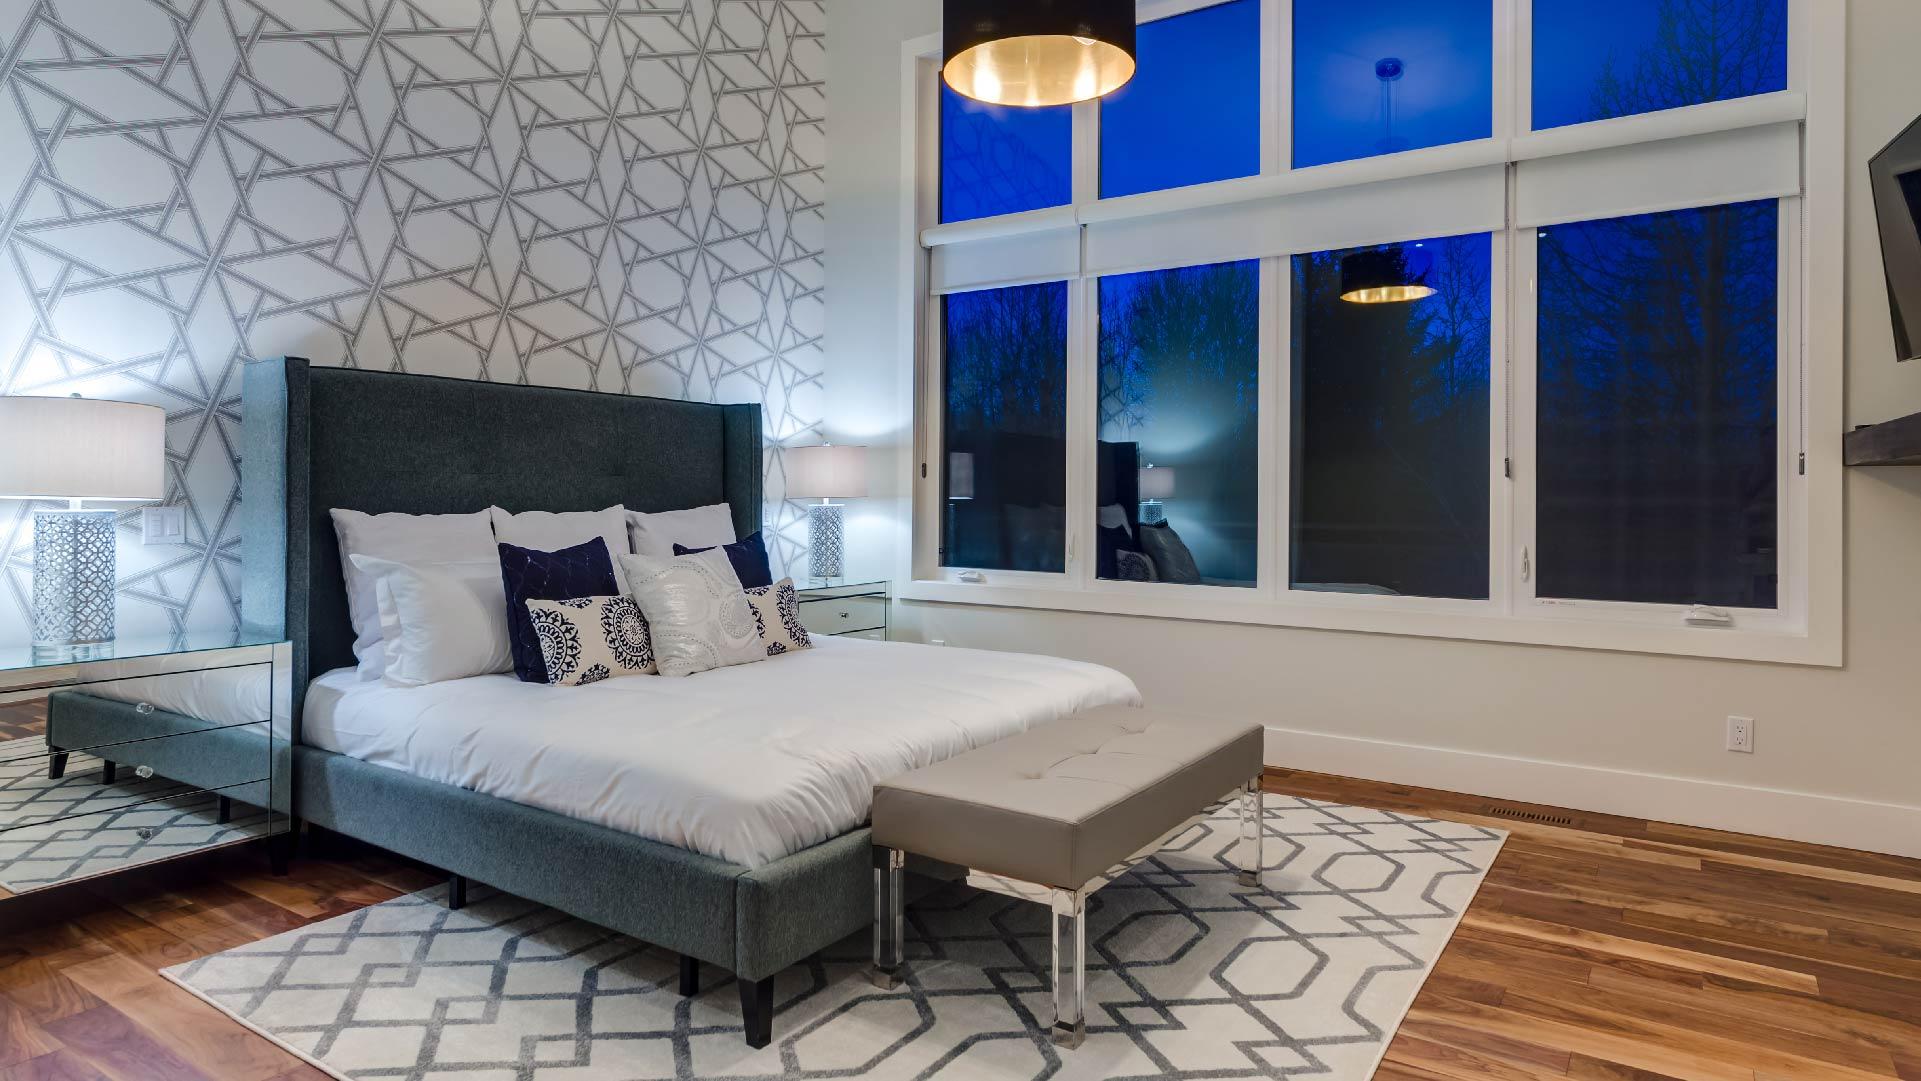 Custom home inspiration - Silverhorn bed